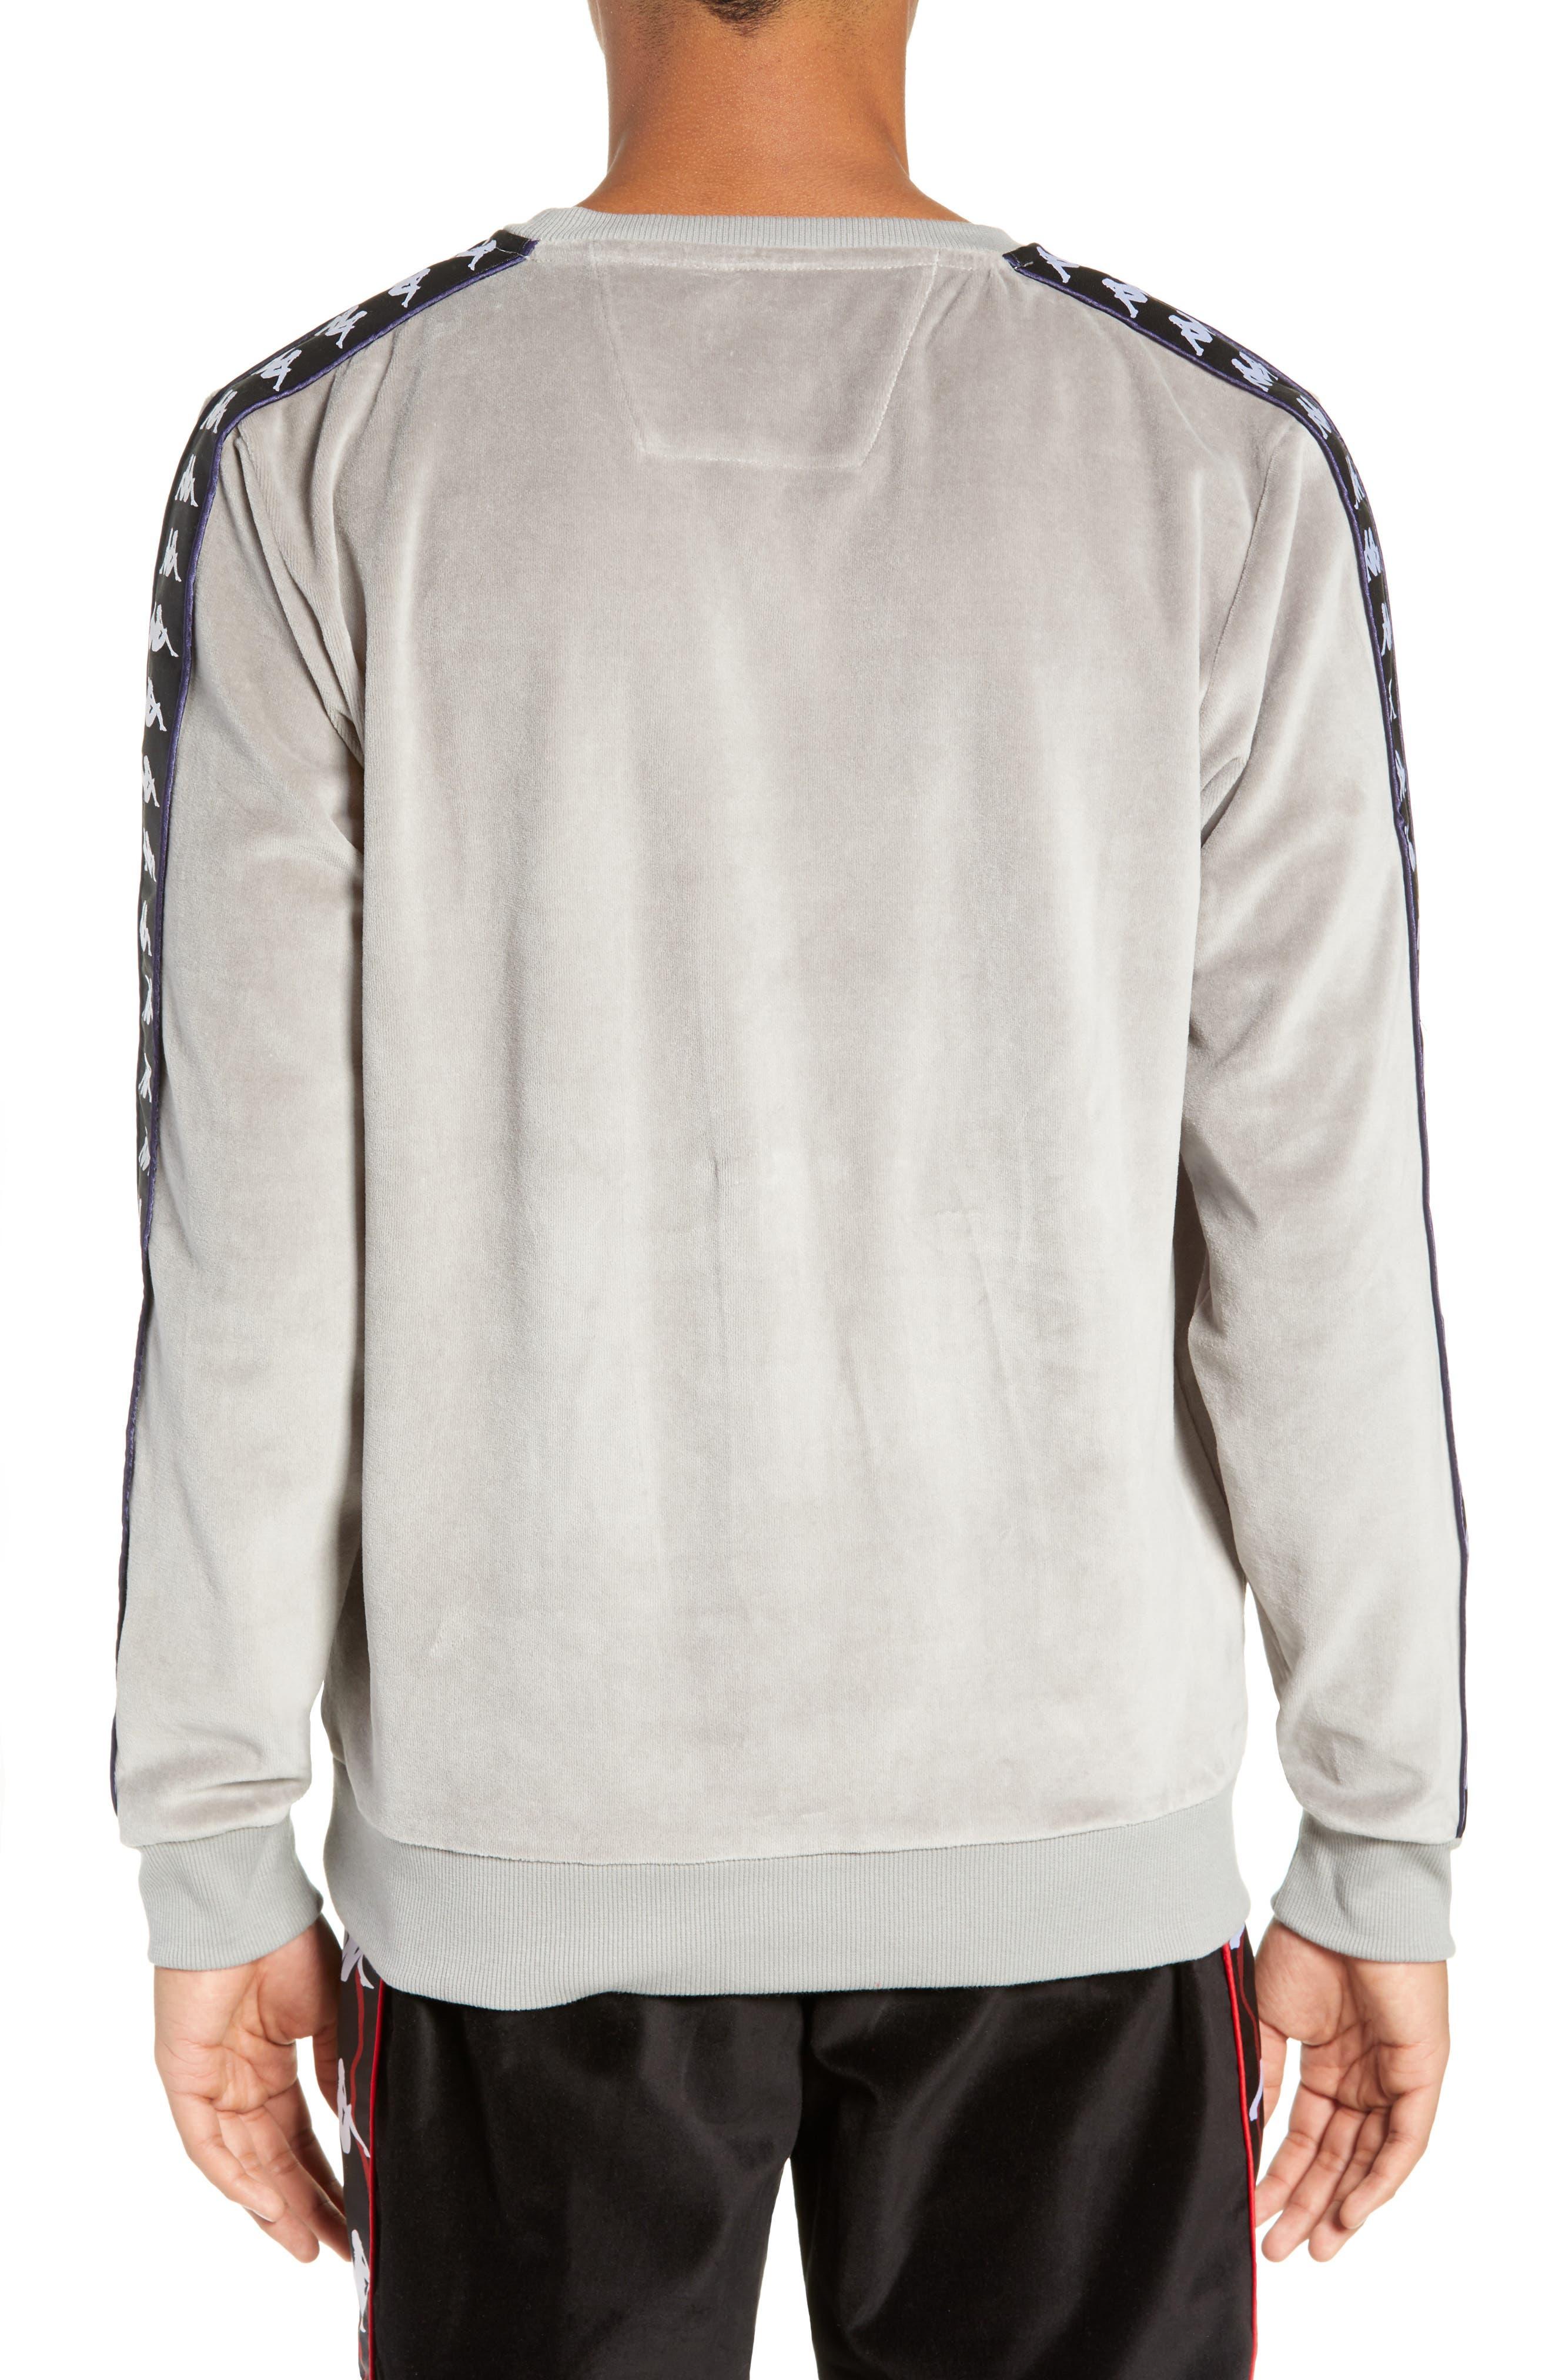 Authentic Aynset Velour Crewneck Sweatshirt,                             Alternate thumbnail 2, color,                             GREY MIST/ BLACK/ WHITE